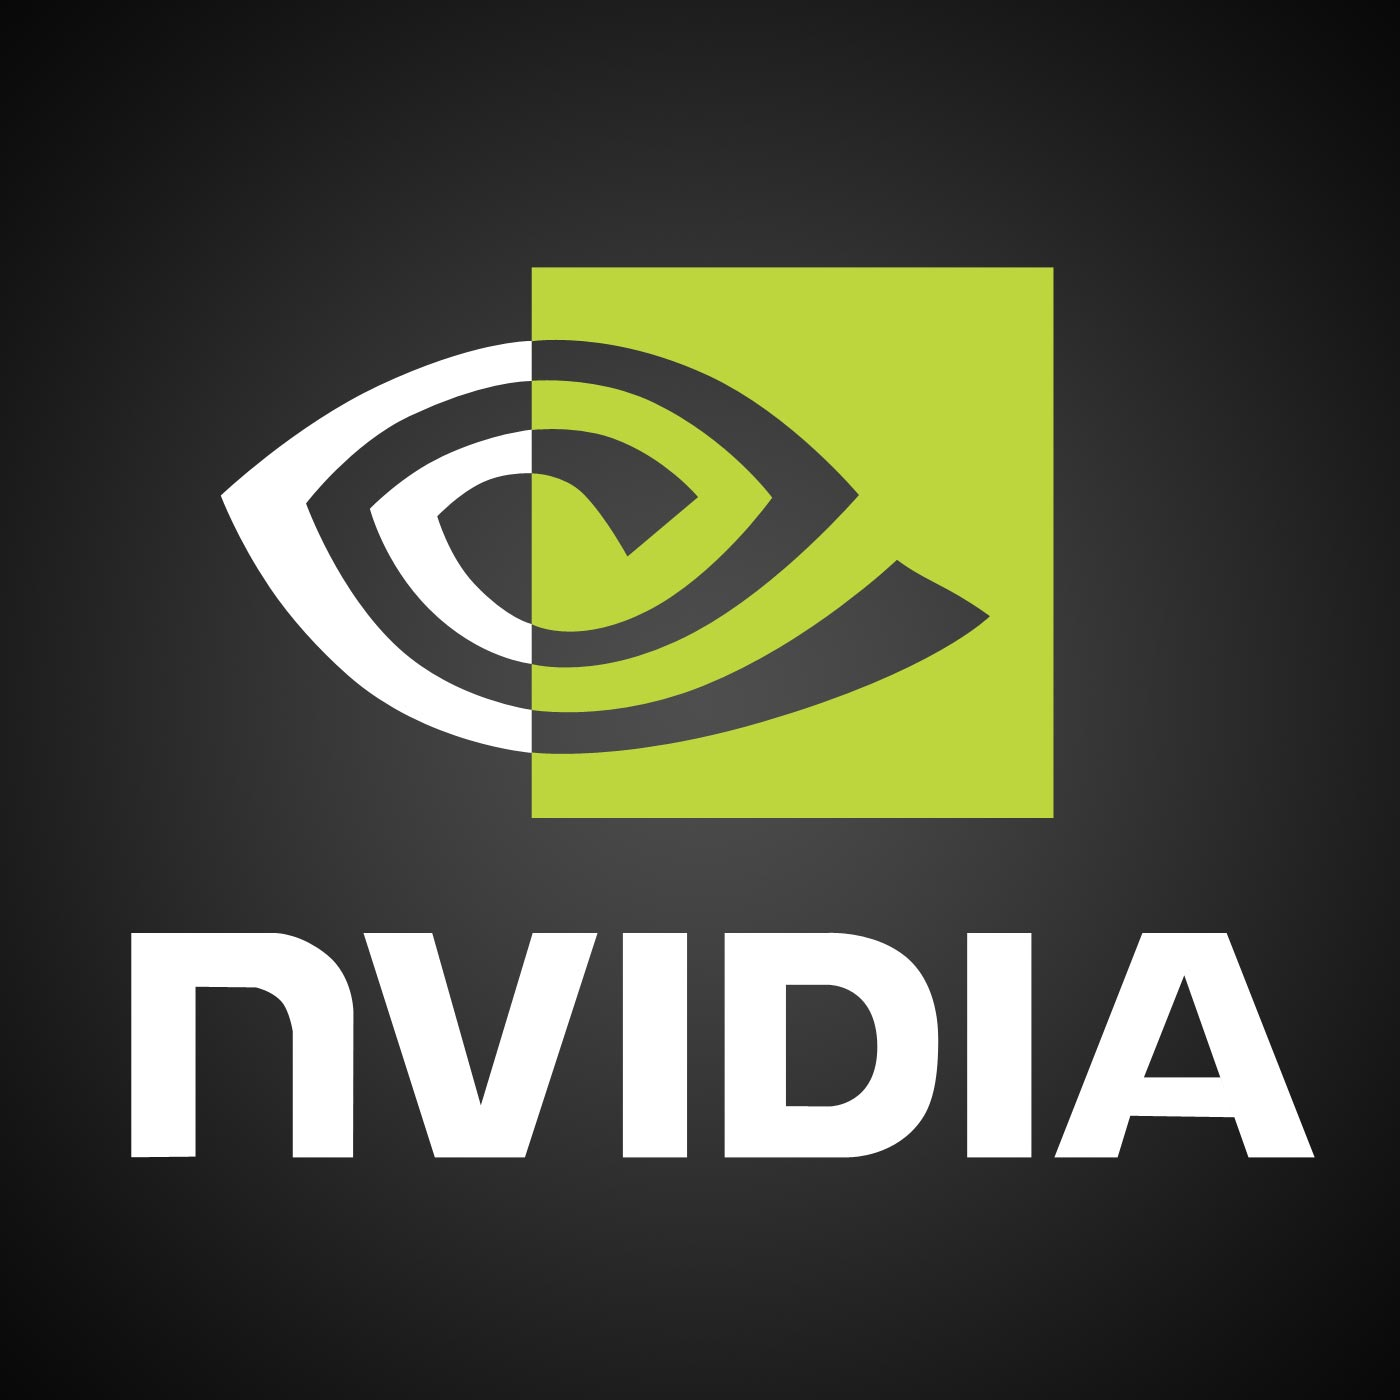 Lenovo plant wohl Windows RT-Tablet mit Tegra 3 Chipsatz-nvidia-logo.jpg